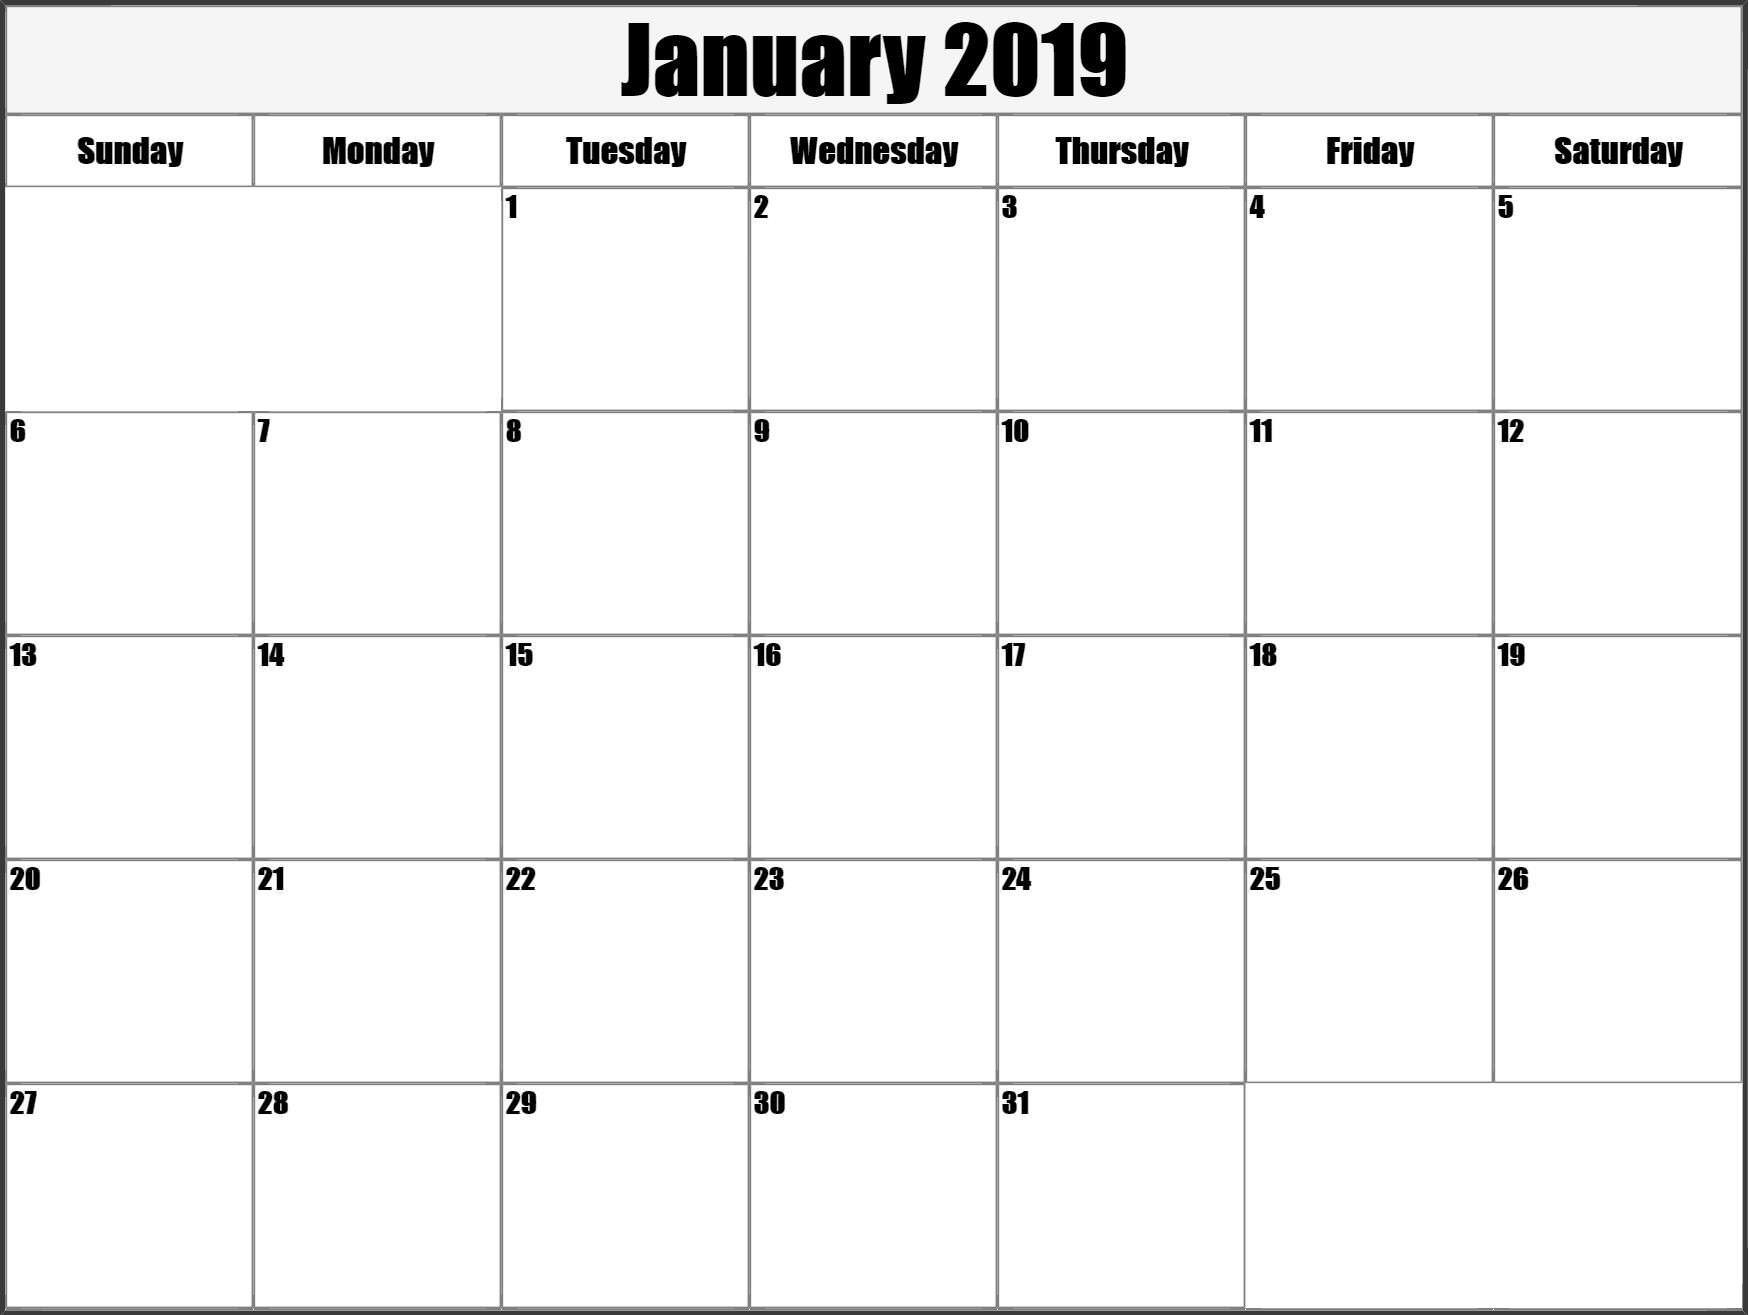 Calendar January 2019 Printable Large   Calendar January 2019 in Large Blank Monthly Calendars January Printable